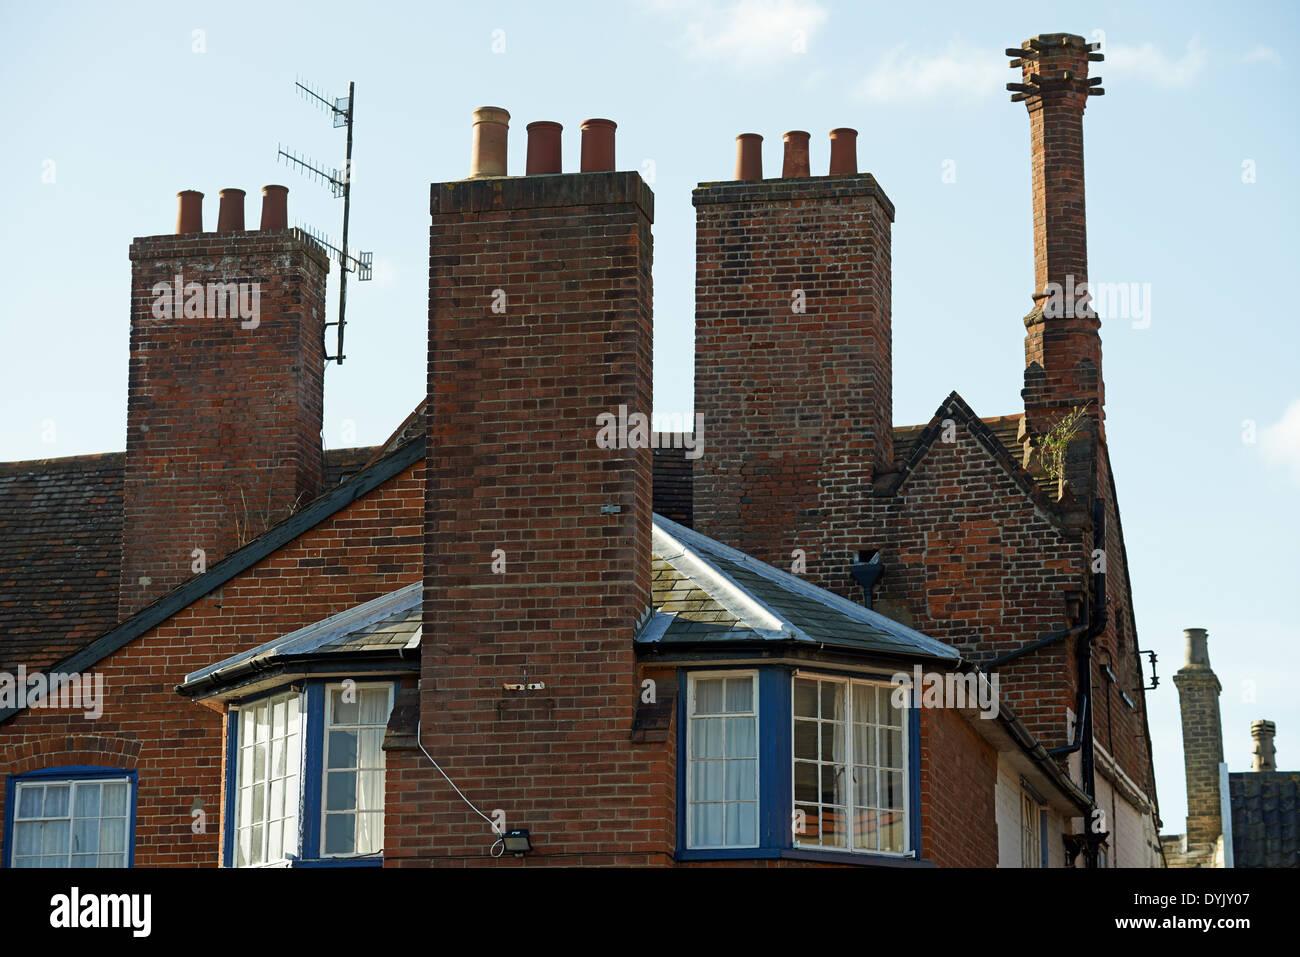 Chimney pots - Stock Image